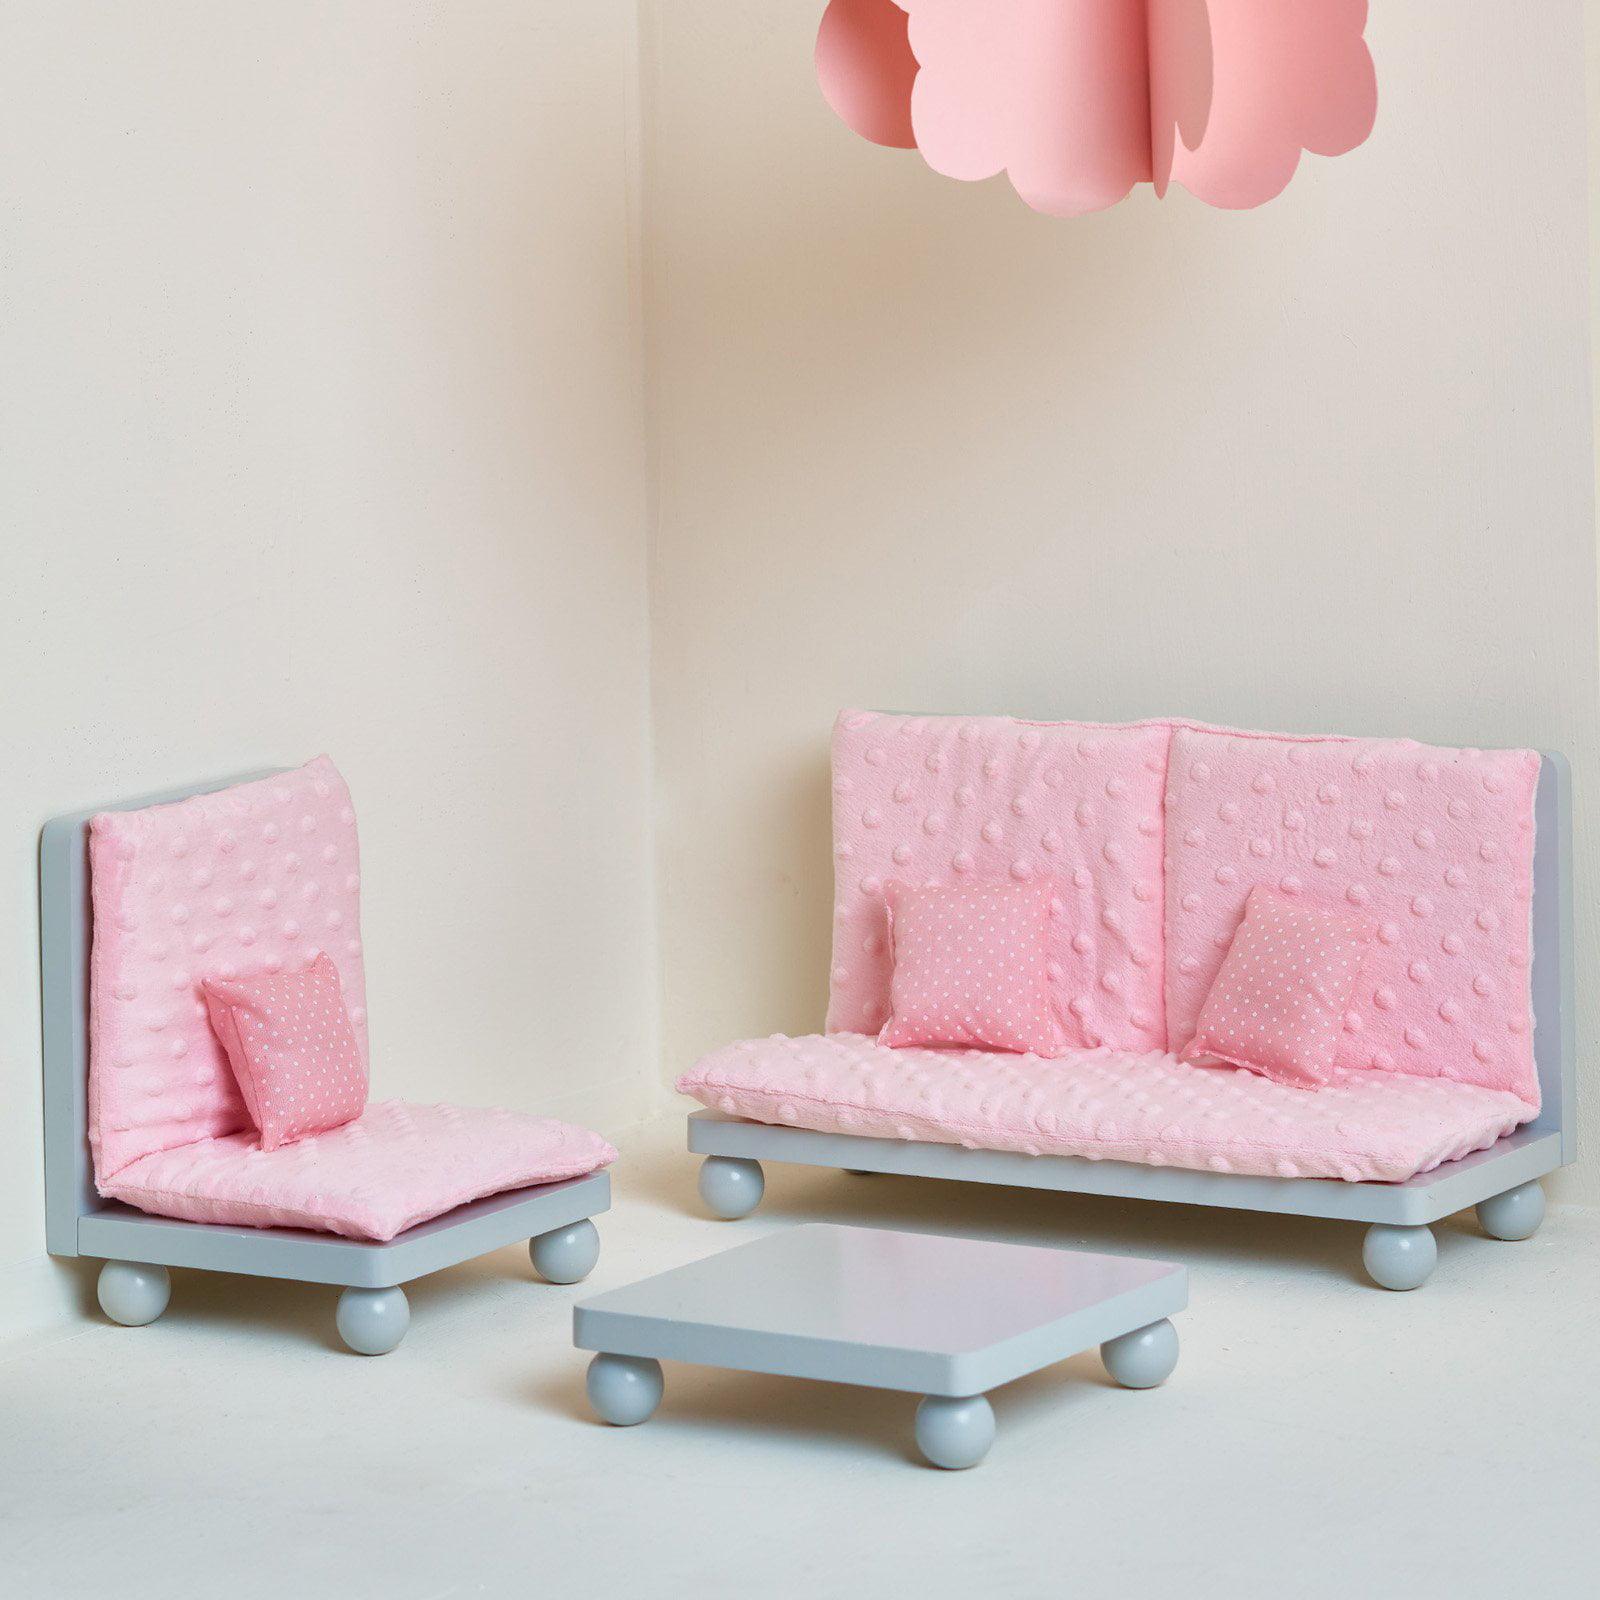 Olivia's Little World 18 inch Doll Furniture Soft Pink Lounge Set (Grey Polka Dots) by Teamson